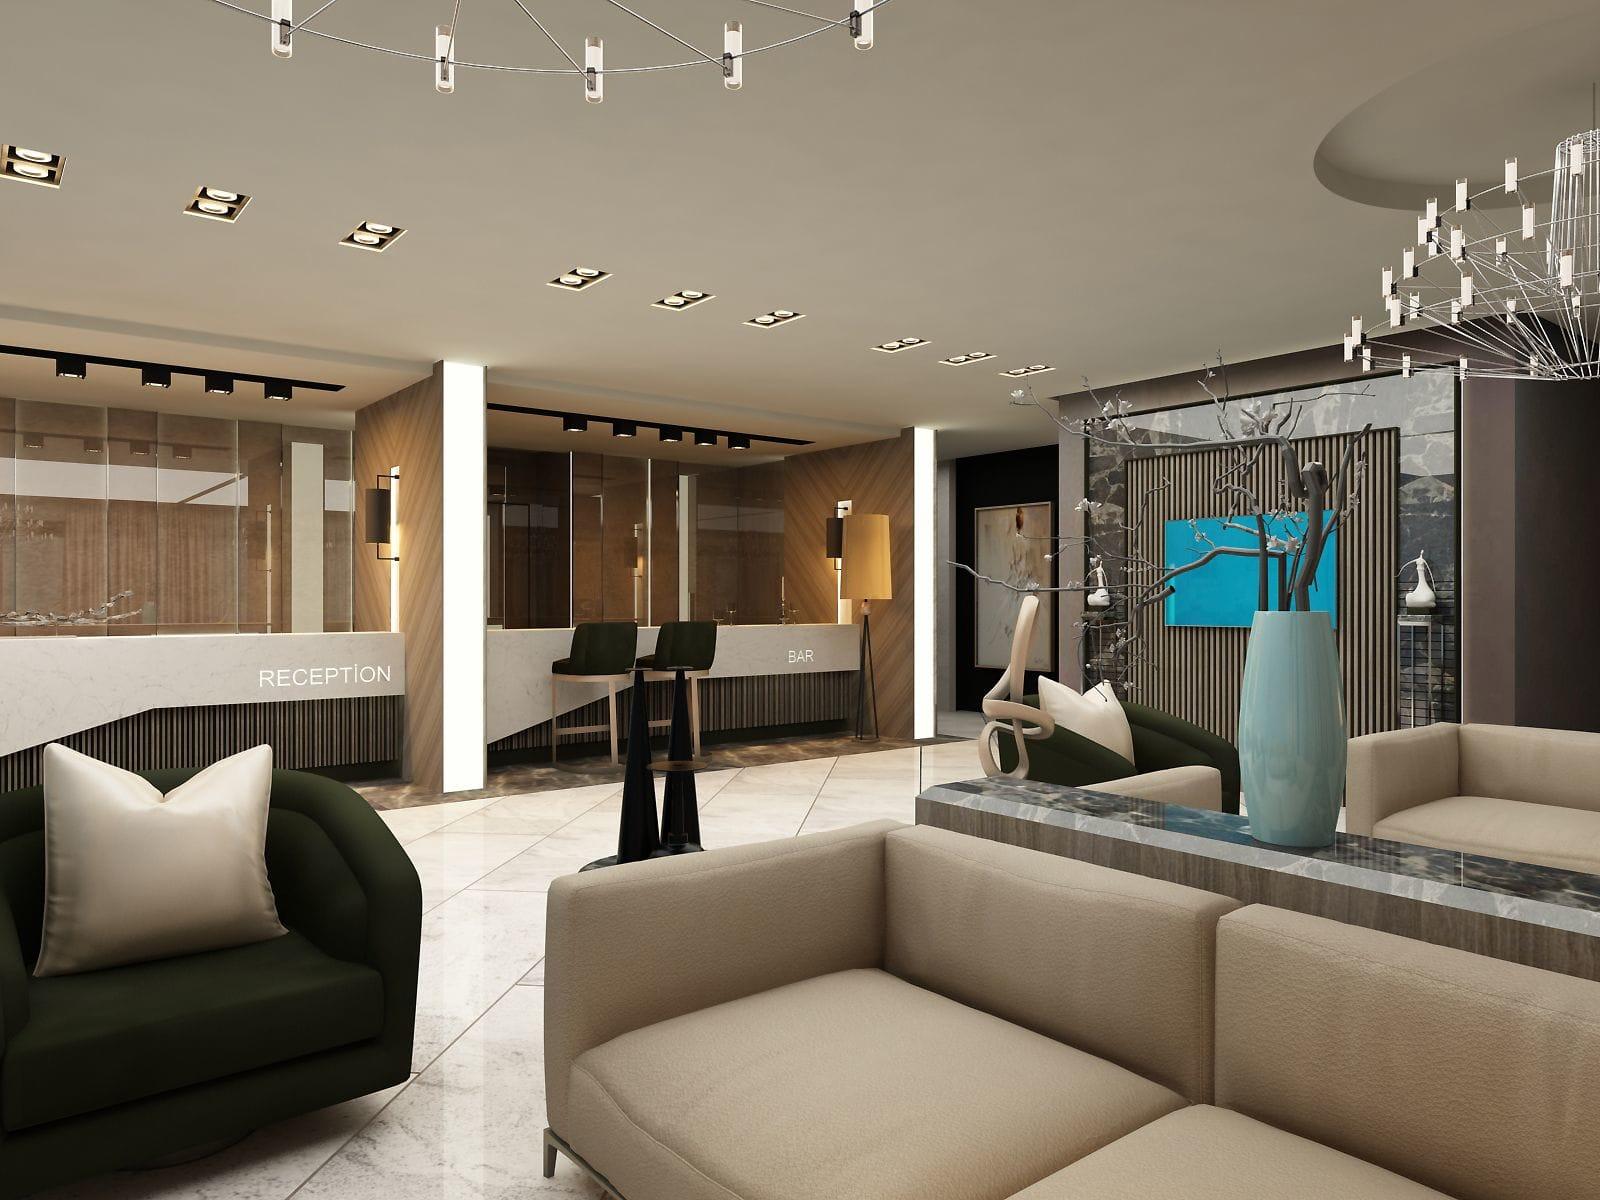 Rodinn Park Hotel